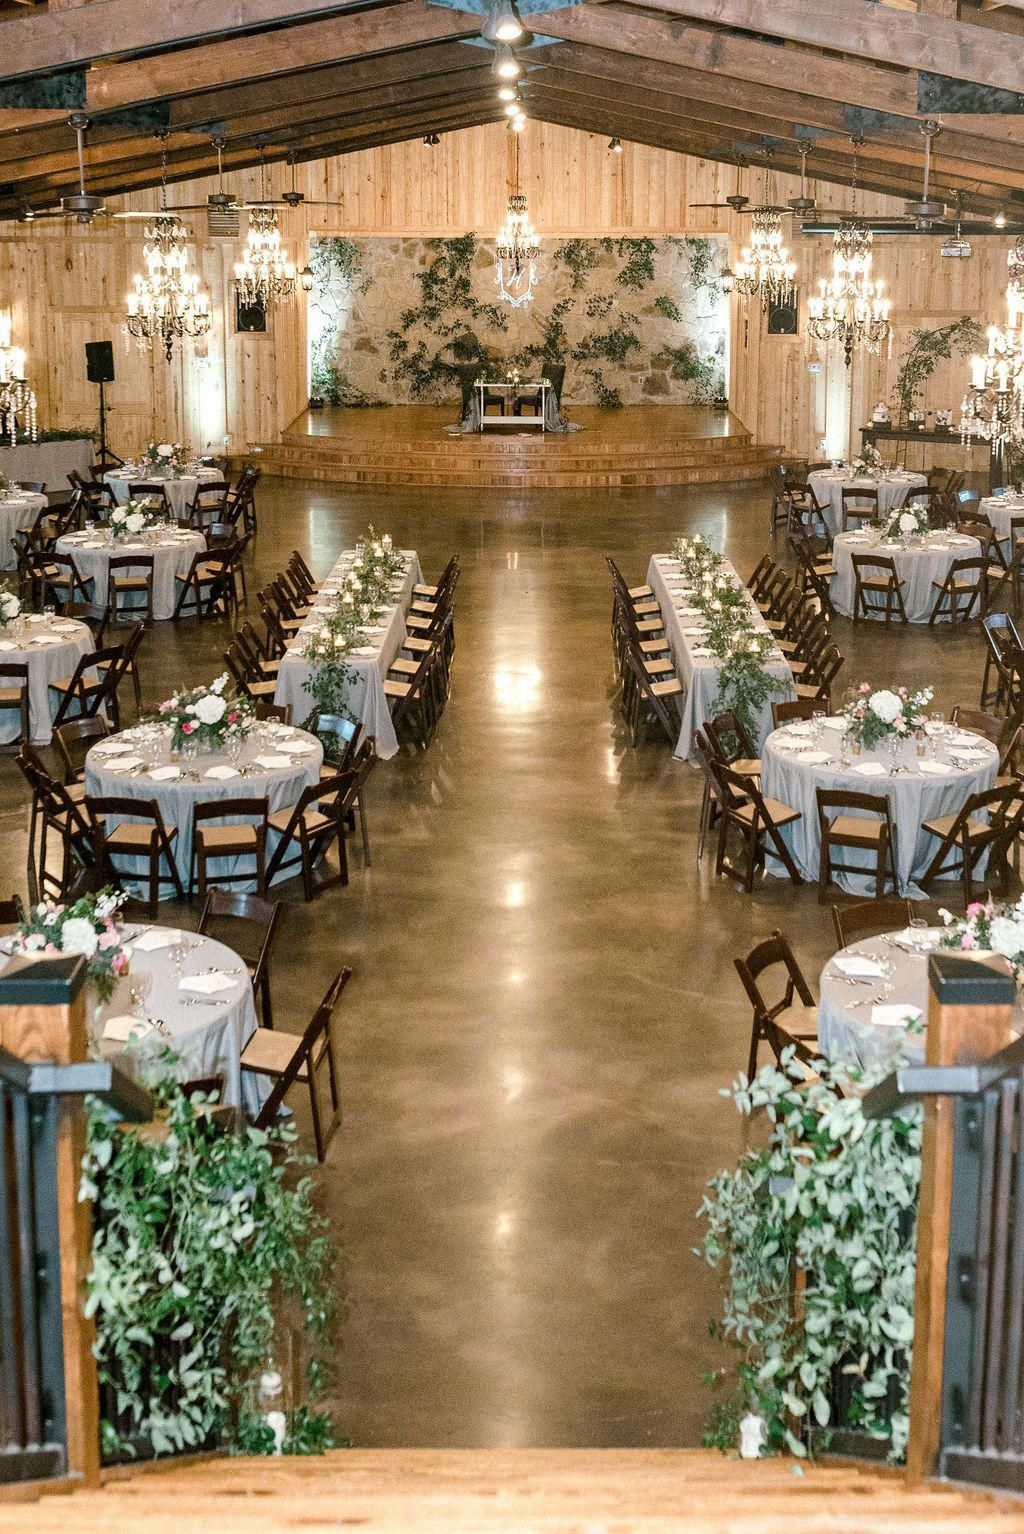 Bohemian Wedding Reception Decorations Neutral Bohemian Wedding Reception With Lo Bohemian Wedding Reception Wedding Venues Indoor Wedding Reception Venues